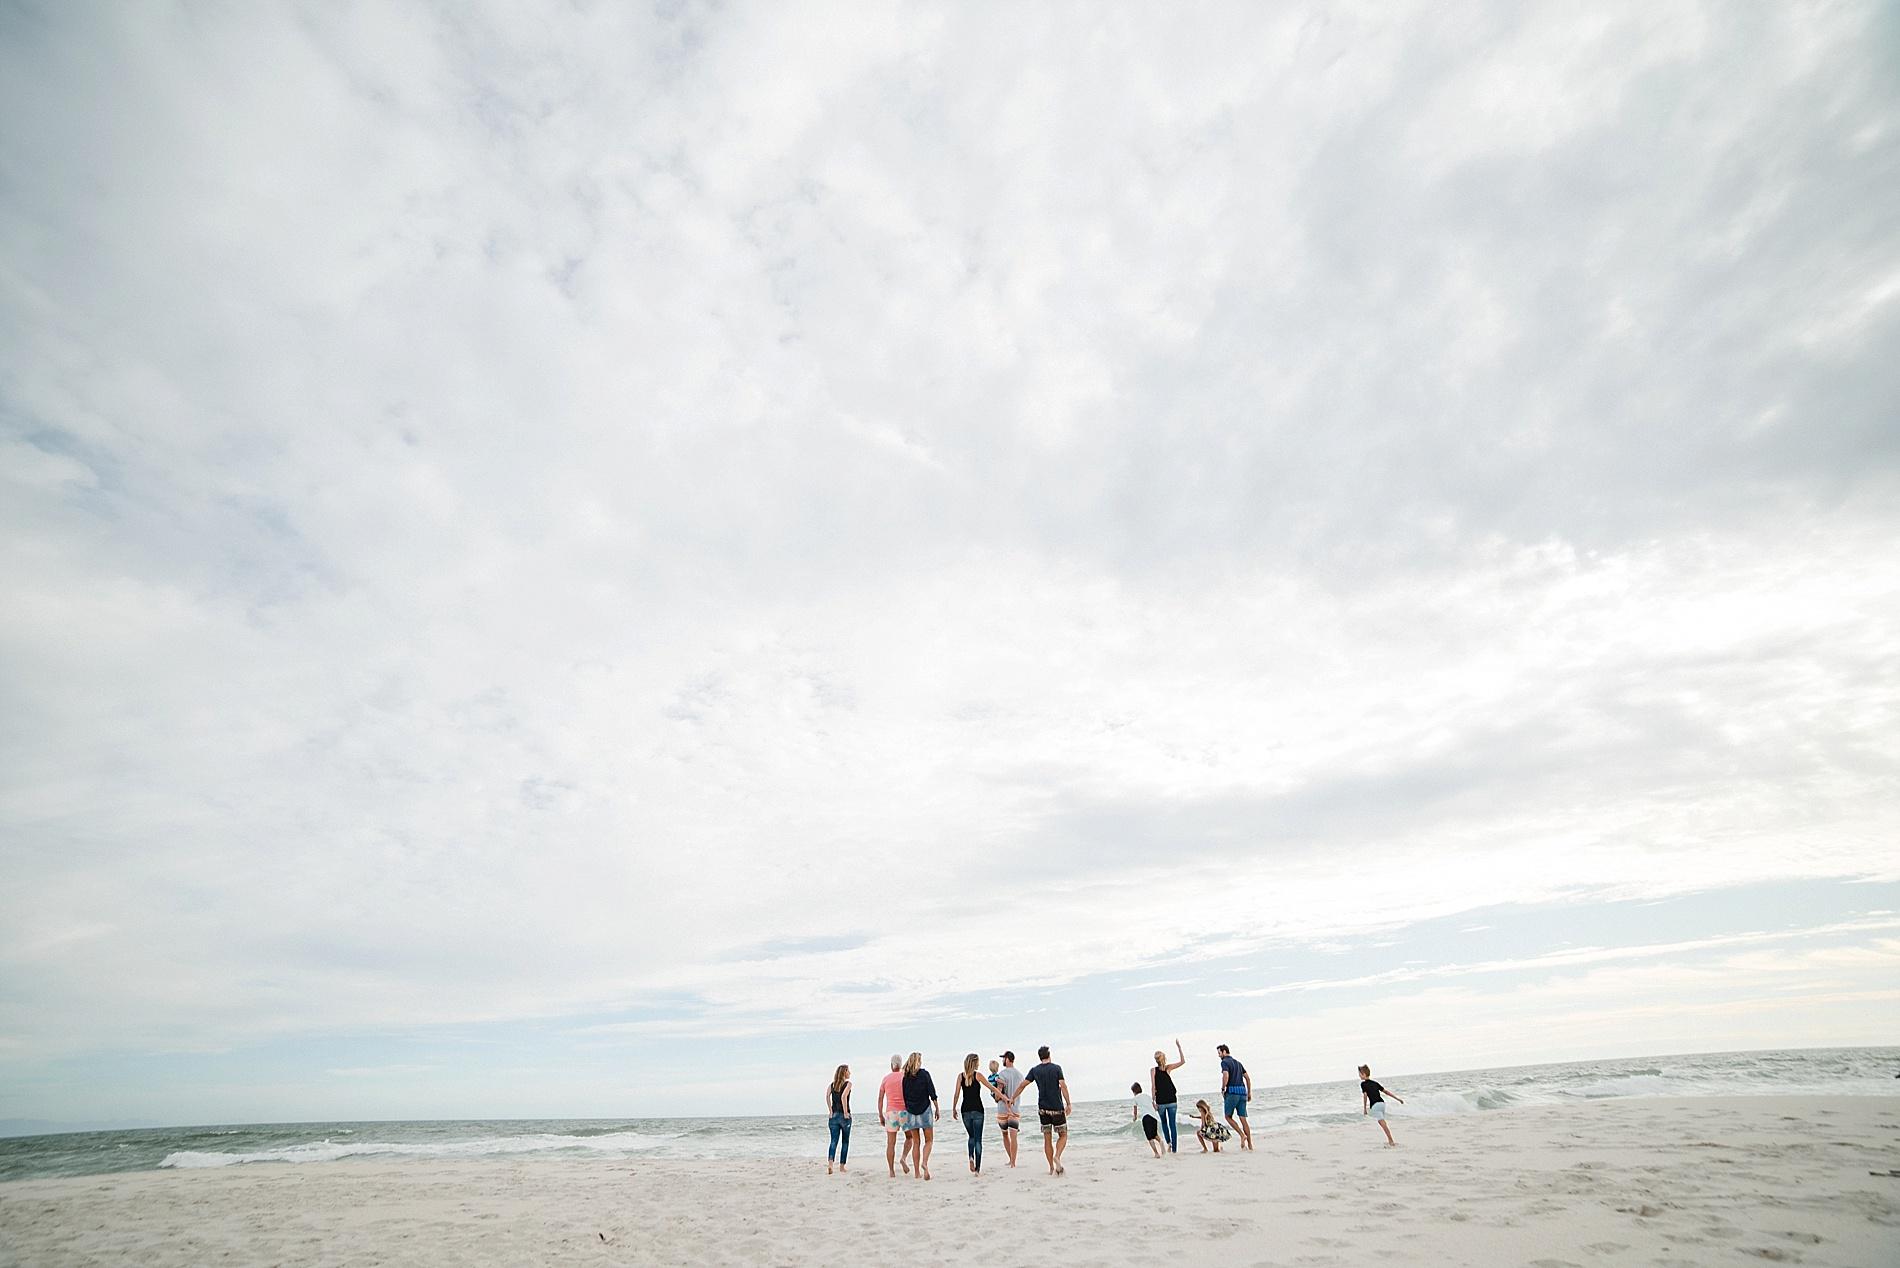 Darren-Bester-Cape-Town-Photographer-Yzerfontein-The-McGregor-Family_0054.jpg